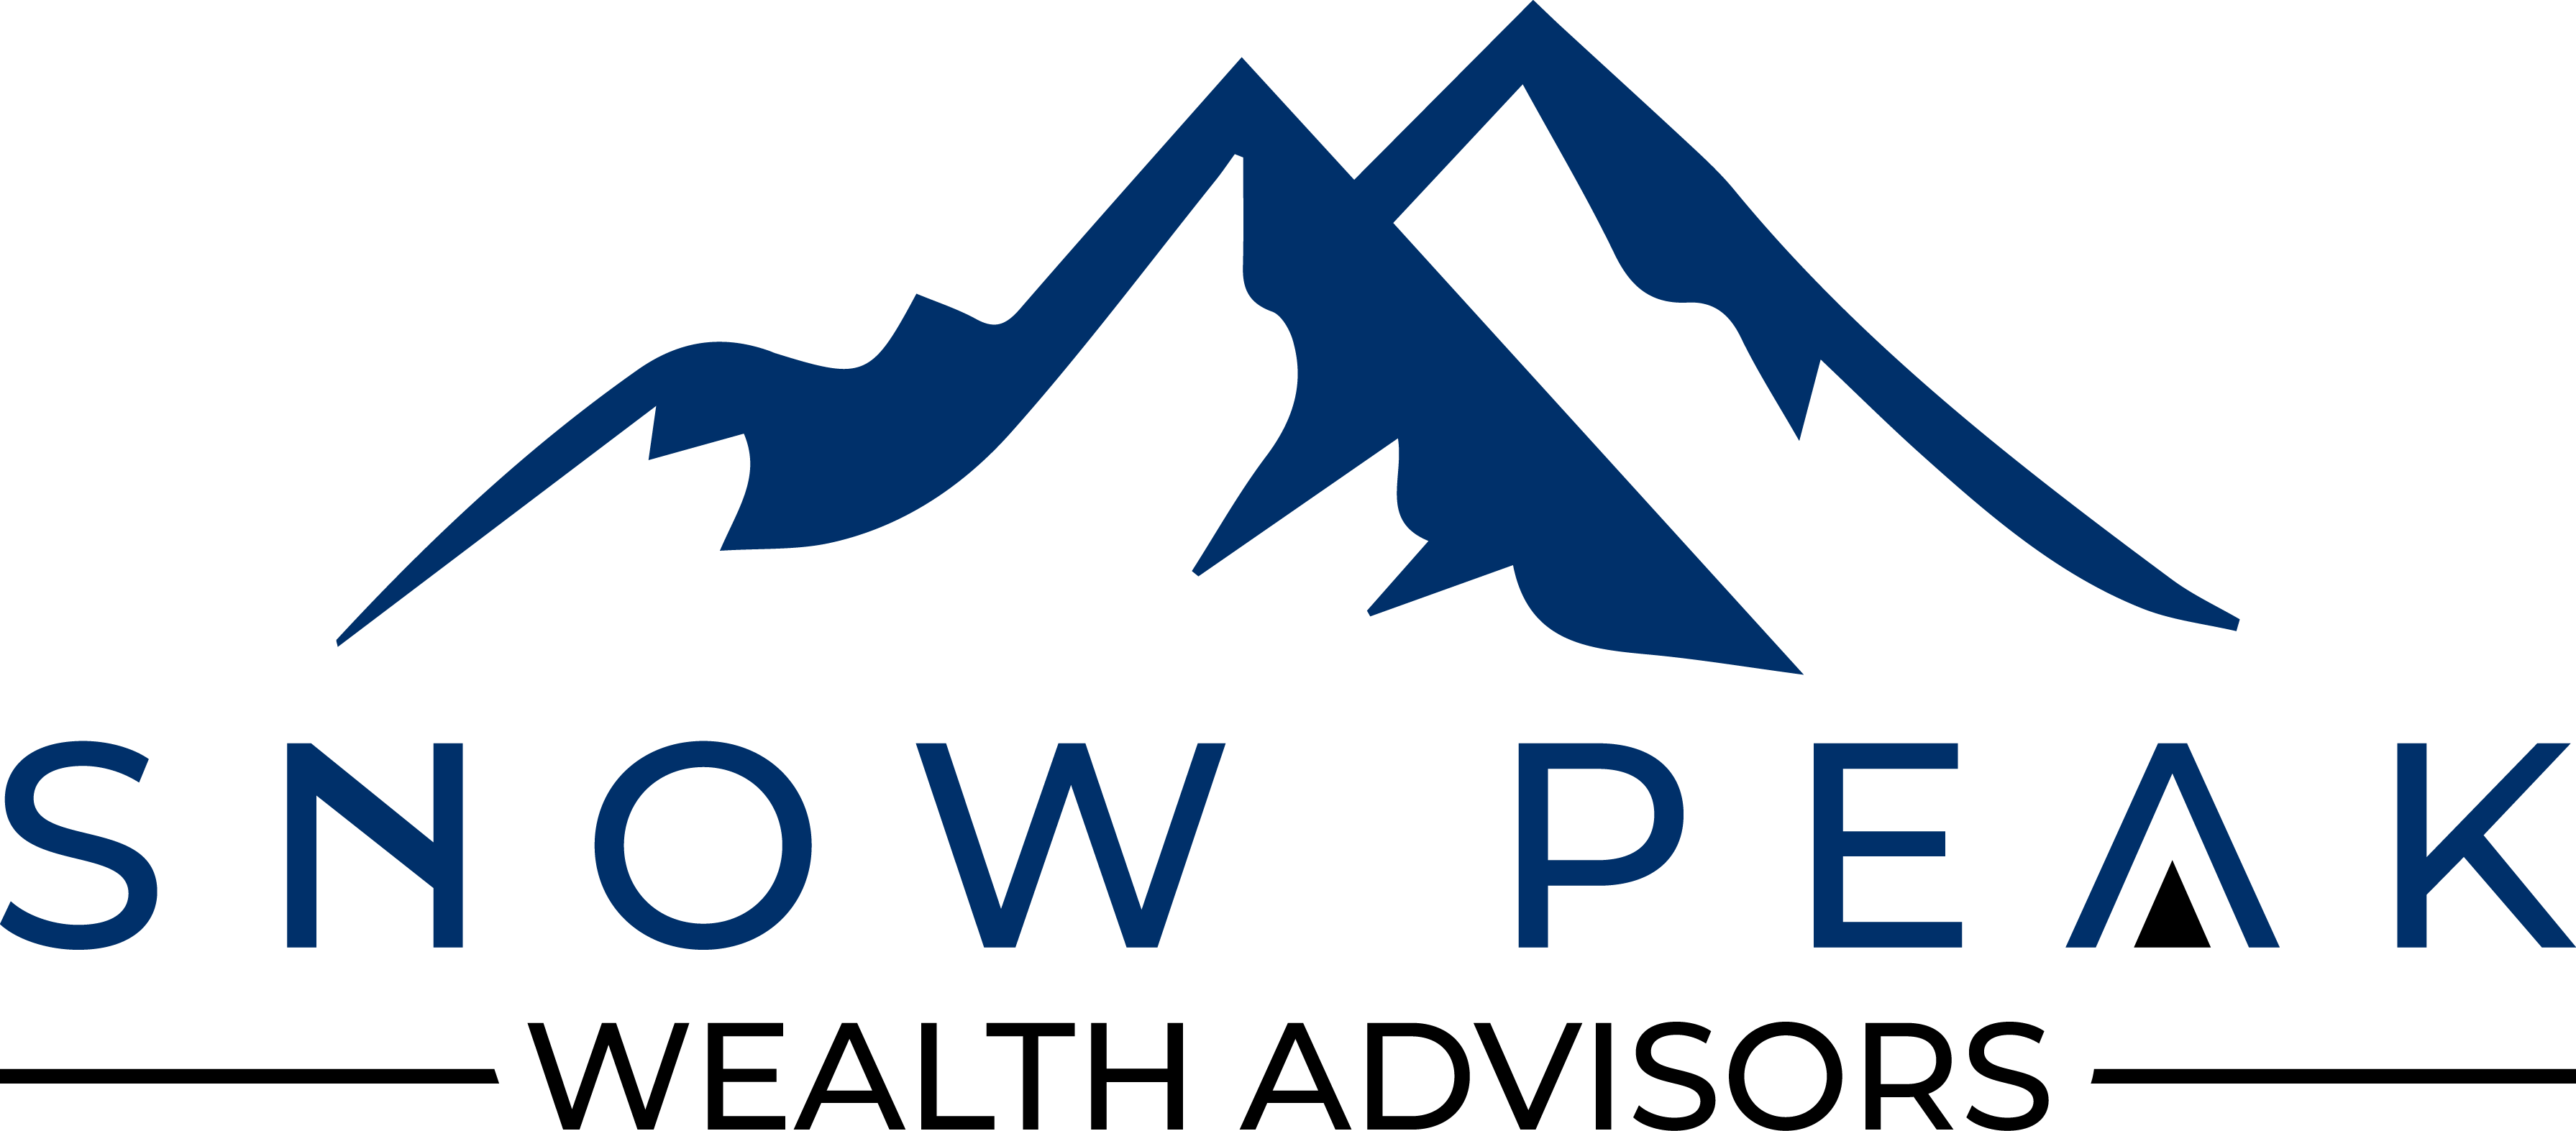 Snow Peak Wealth Advisors